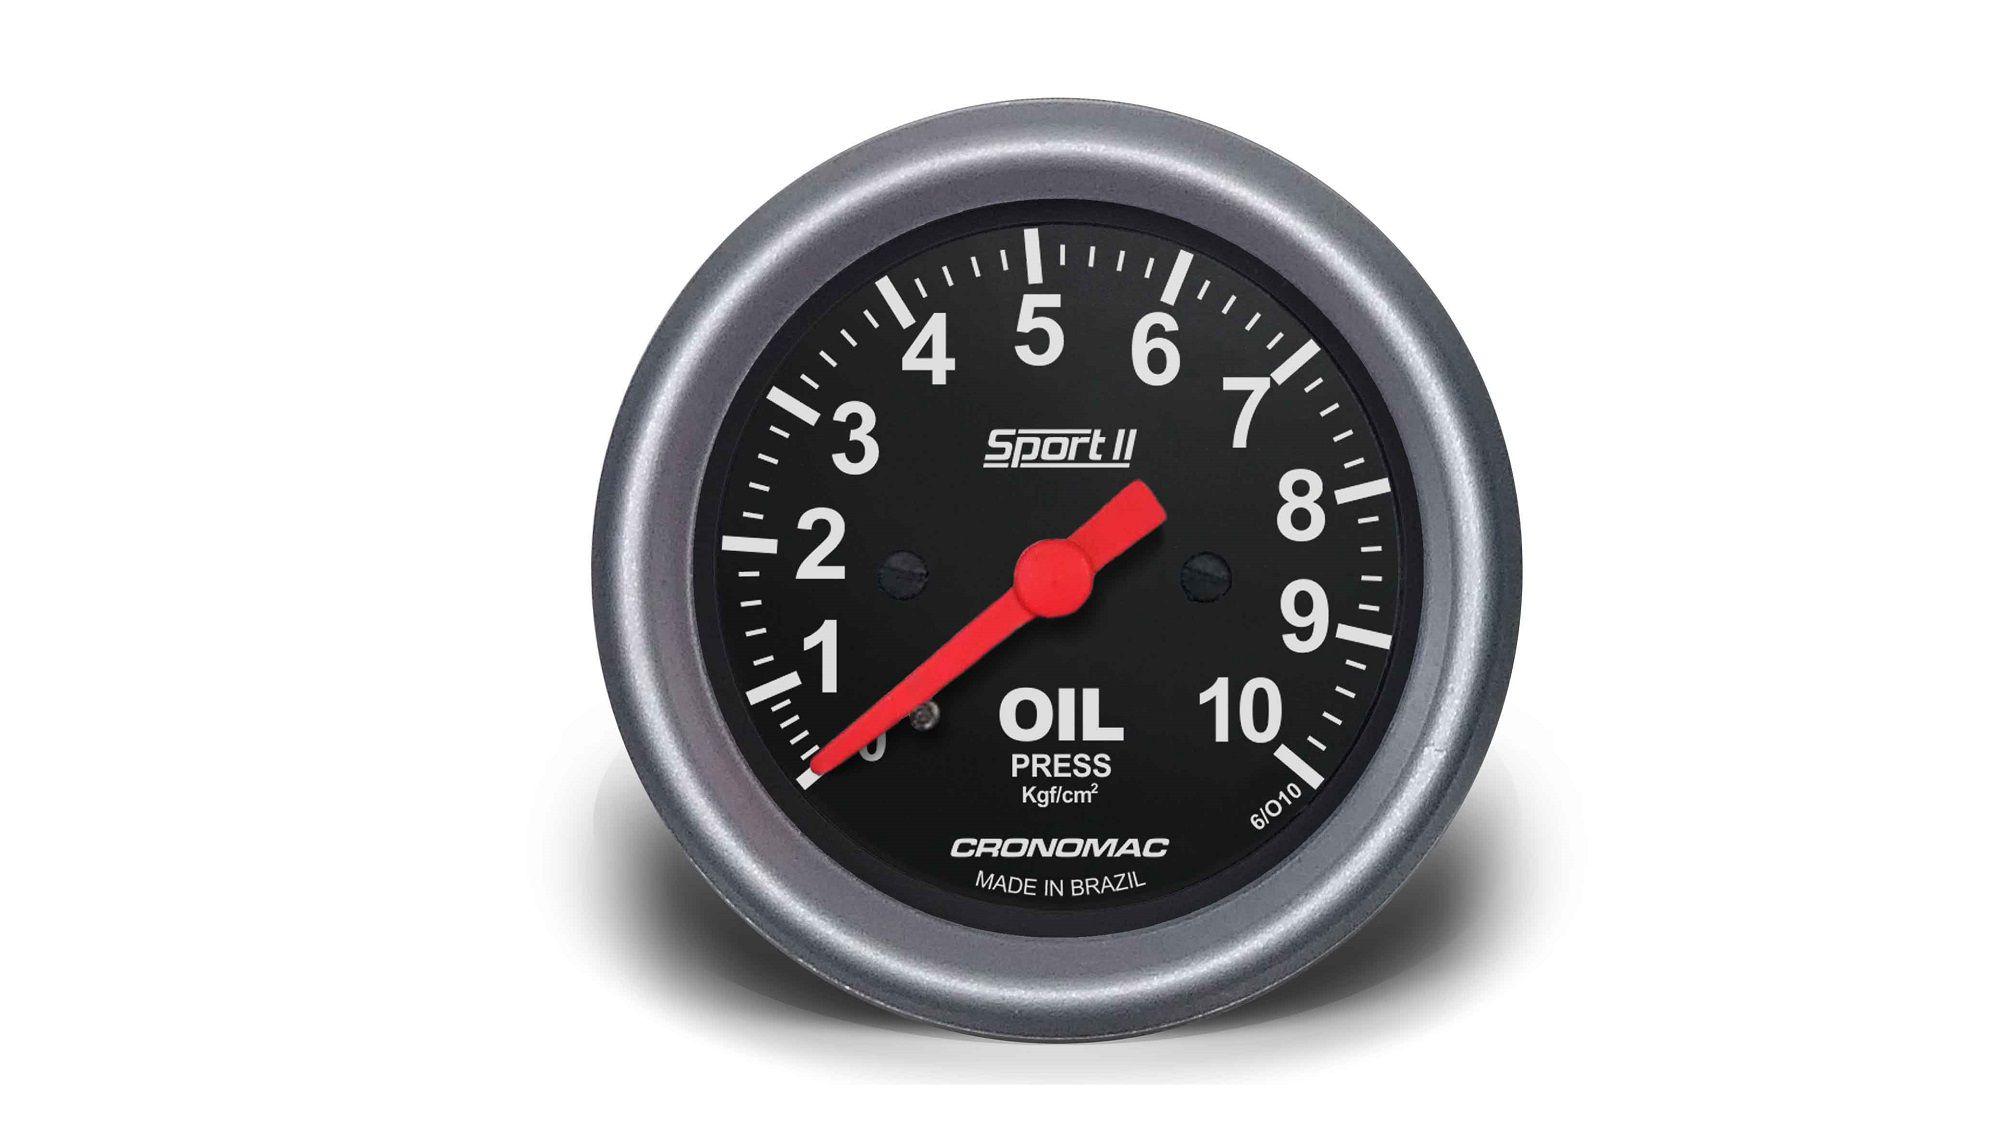 Relogio Pressao de Oleo 10kg Sport II 60mm Cronomac